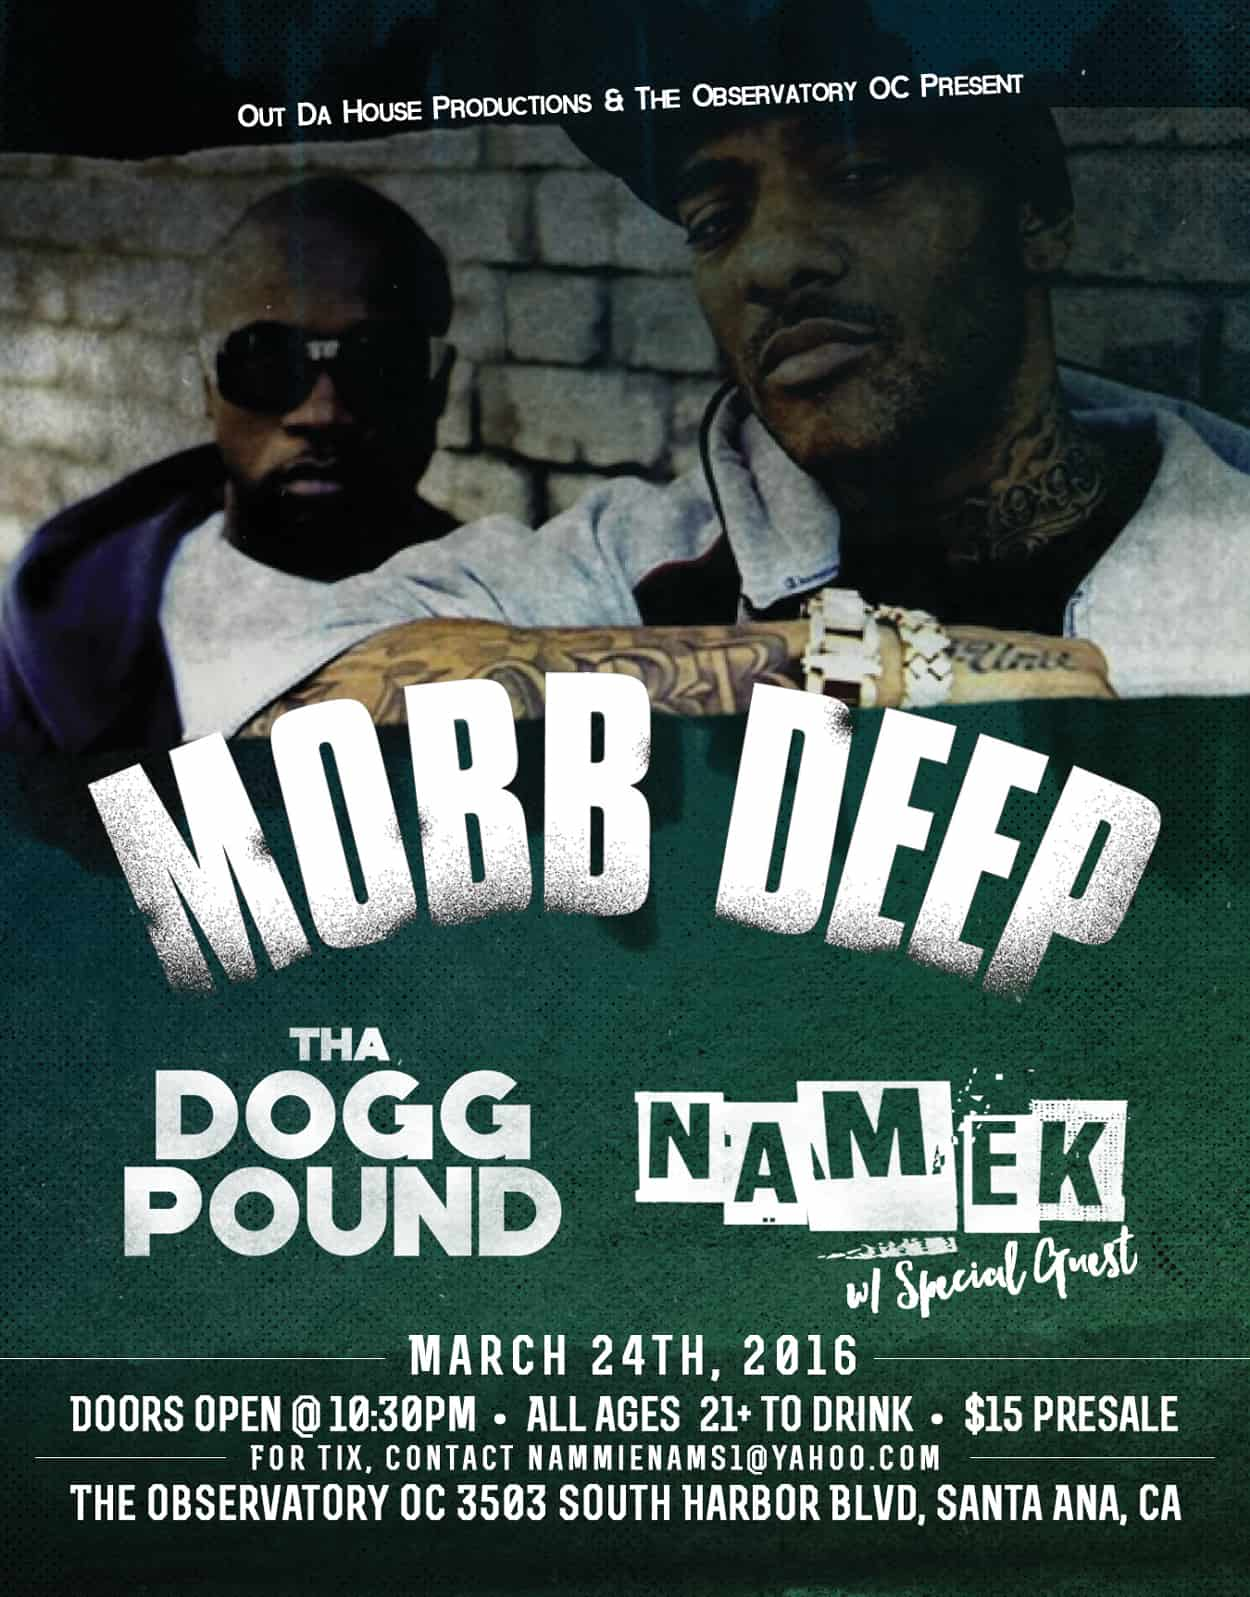 namek - mobb deep - tha dogg pound - flyer design